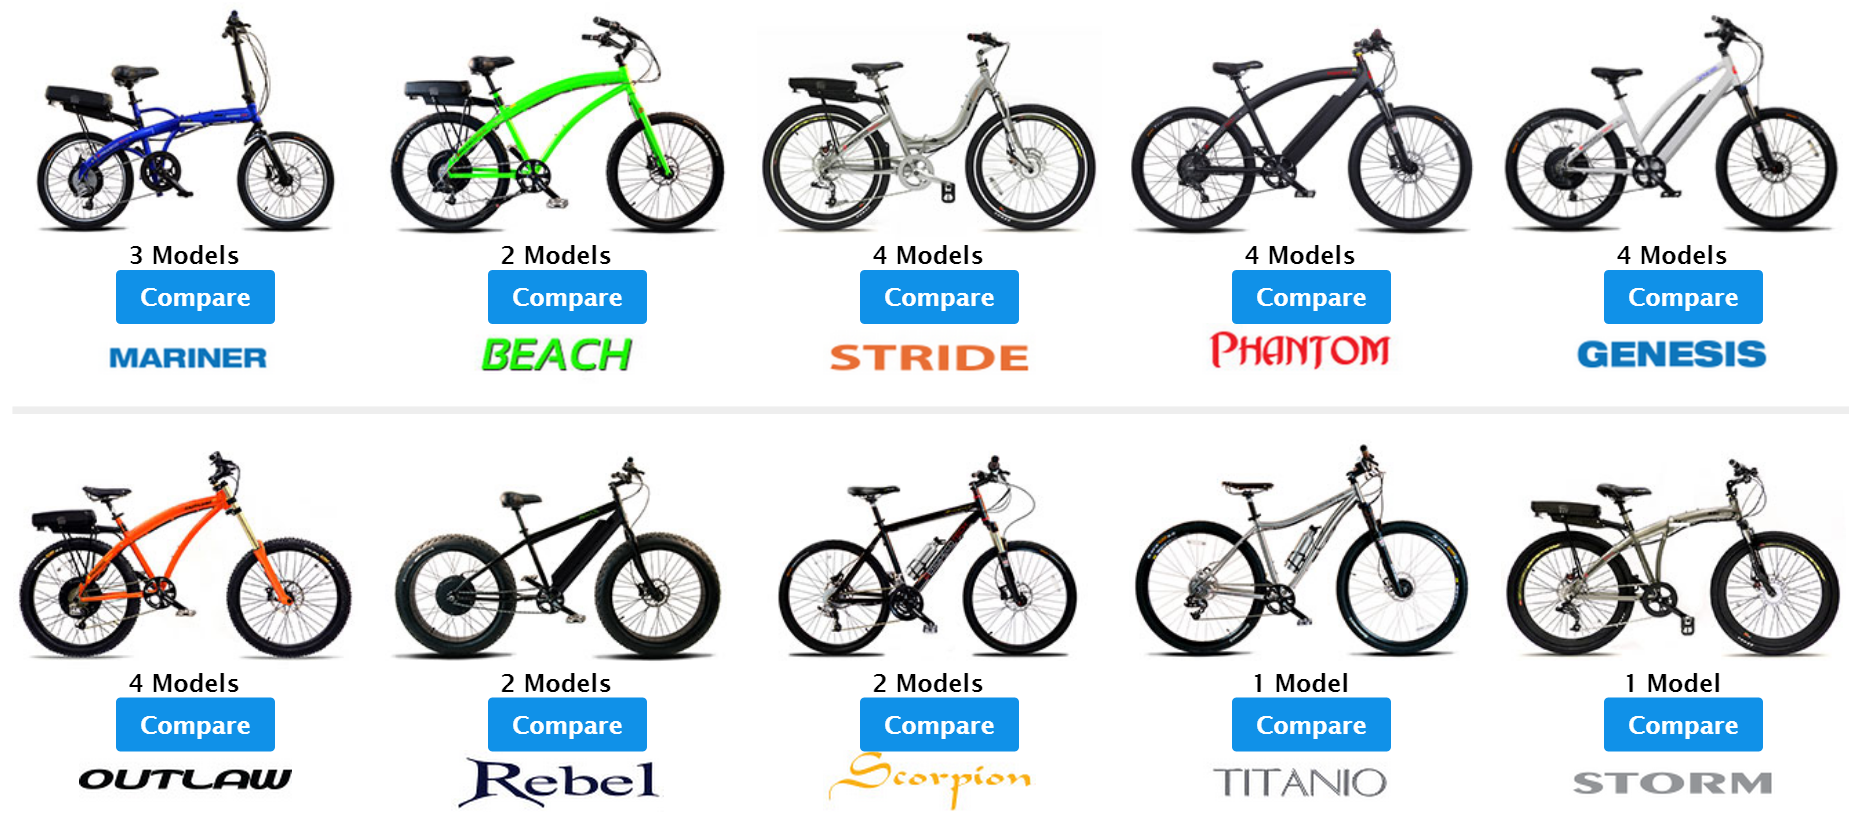 Best Value Electric Bike >> Electric Bike Comparison Top 5 Best Value Electric Bikes Go Get Eco